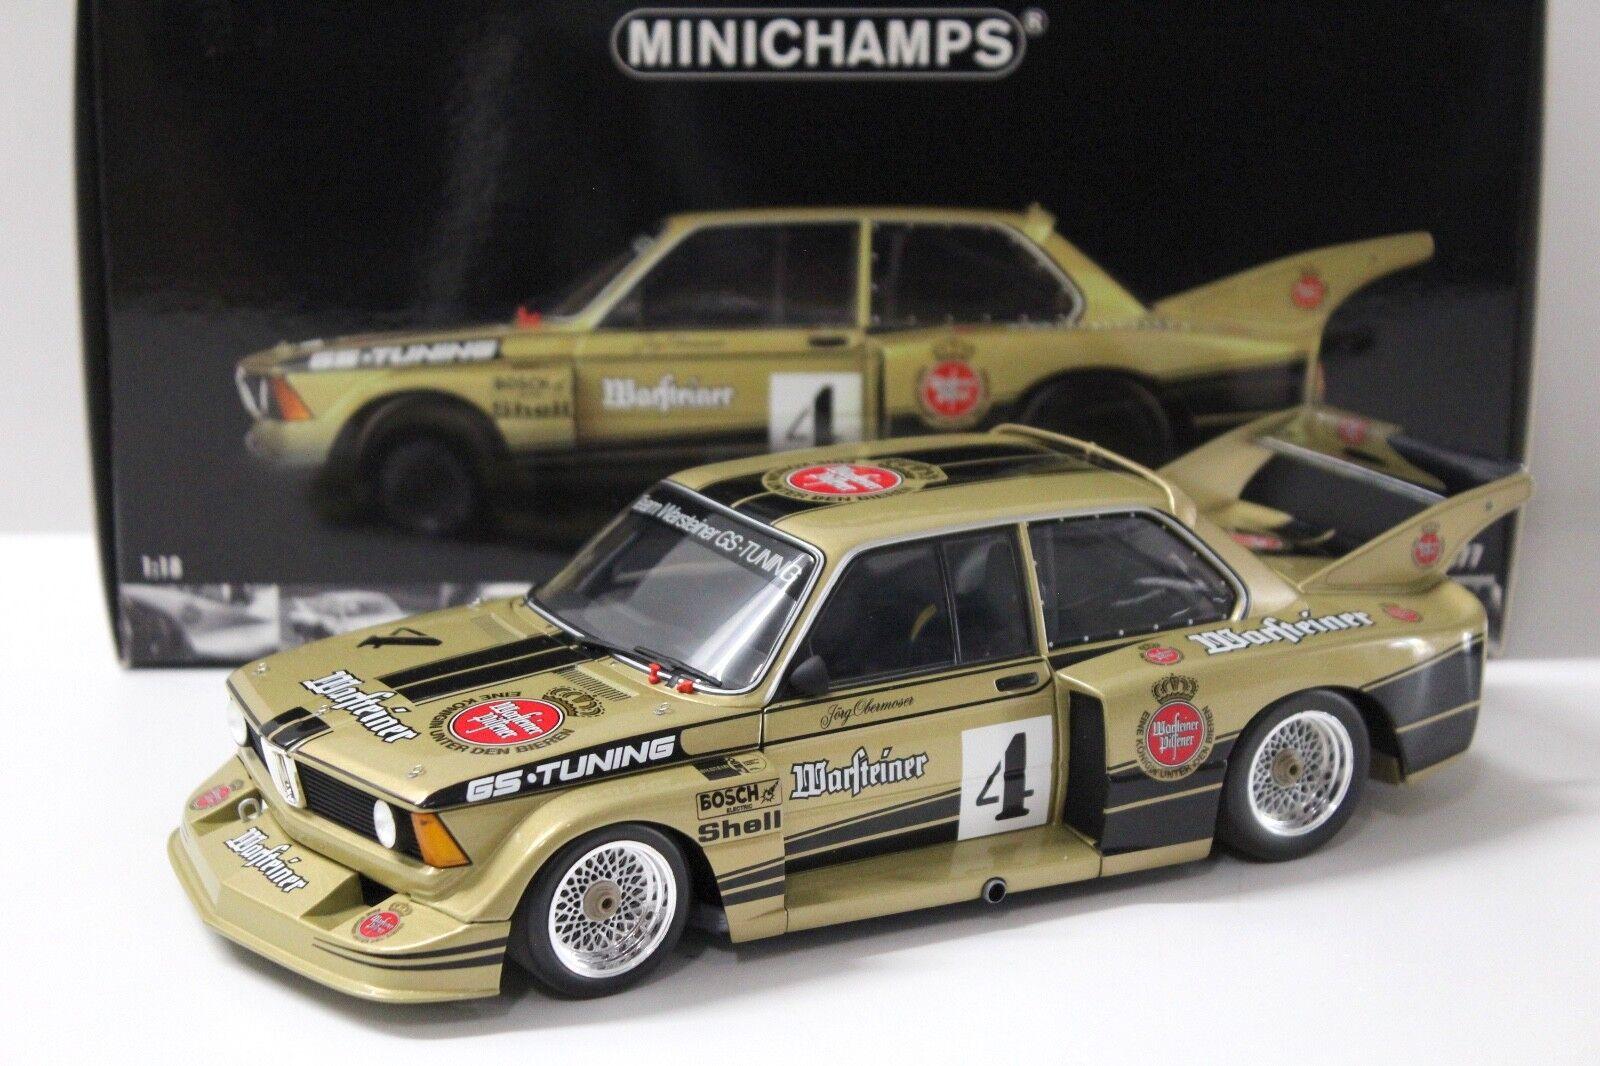 1:18 Minichamps BMW 320i superiore Moser DRM 1977 Warsteiner  4 in Premium-MODELCARS